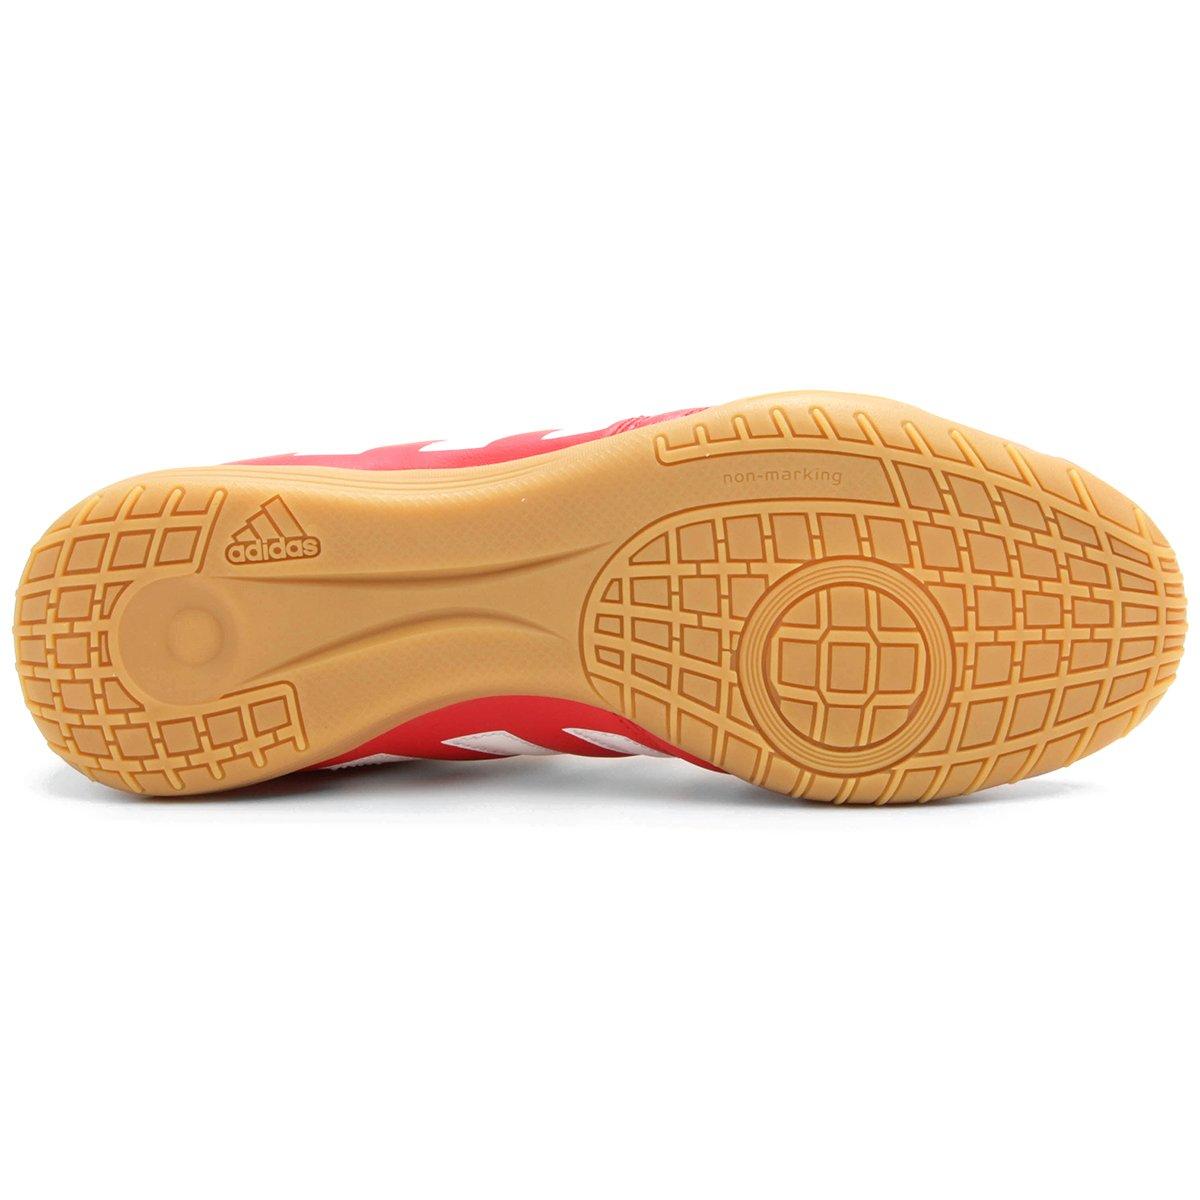 Chuteira Adidas Gloro 16.2 IN Futsal - Vermelho e Branco - Compre ... 8cdc4cfedd767